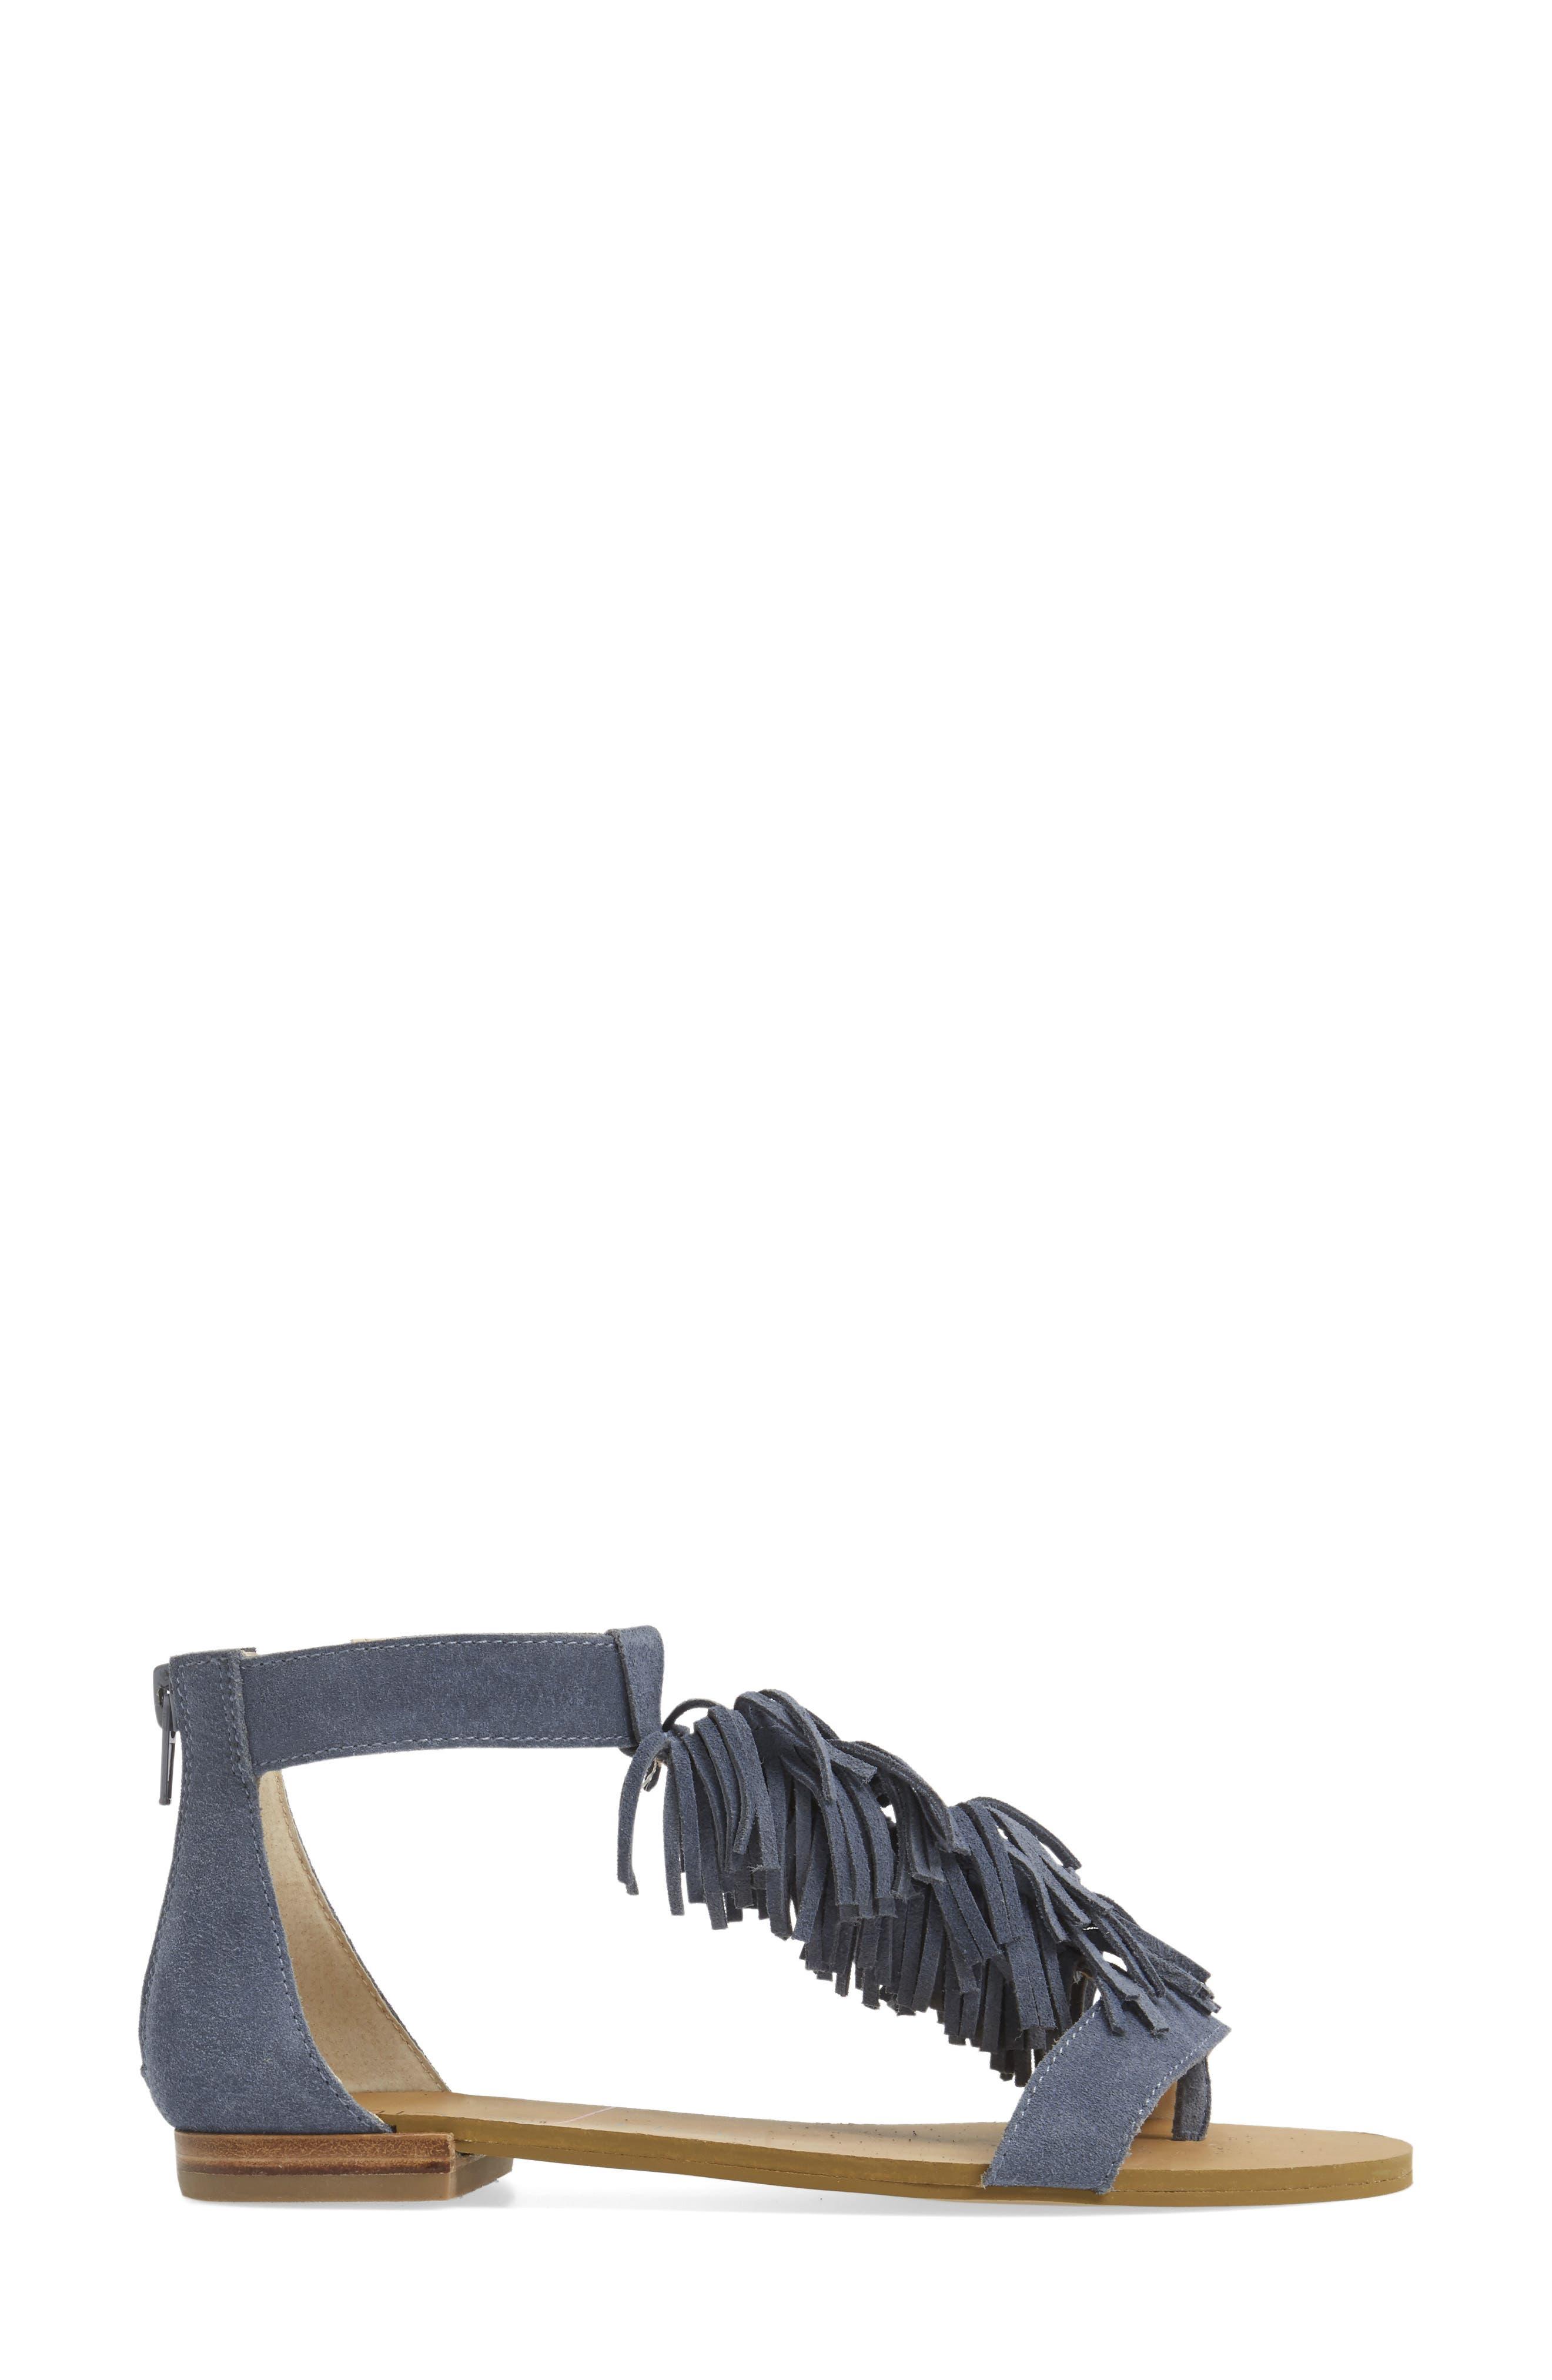 Alternate Image 3  - Sole Society Koa Fringed T-Strap Sandal (Women)